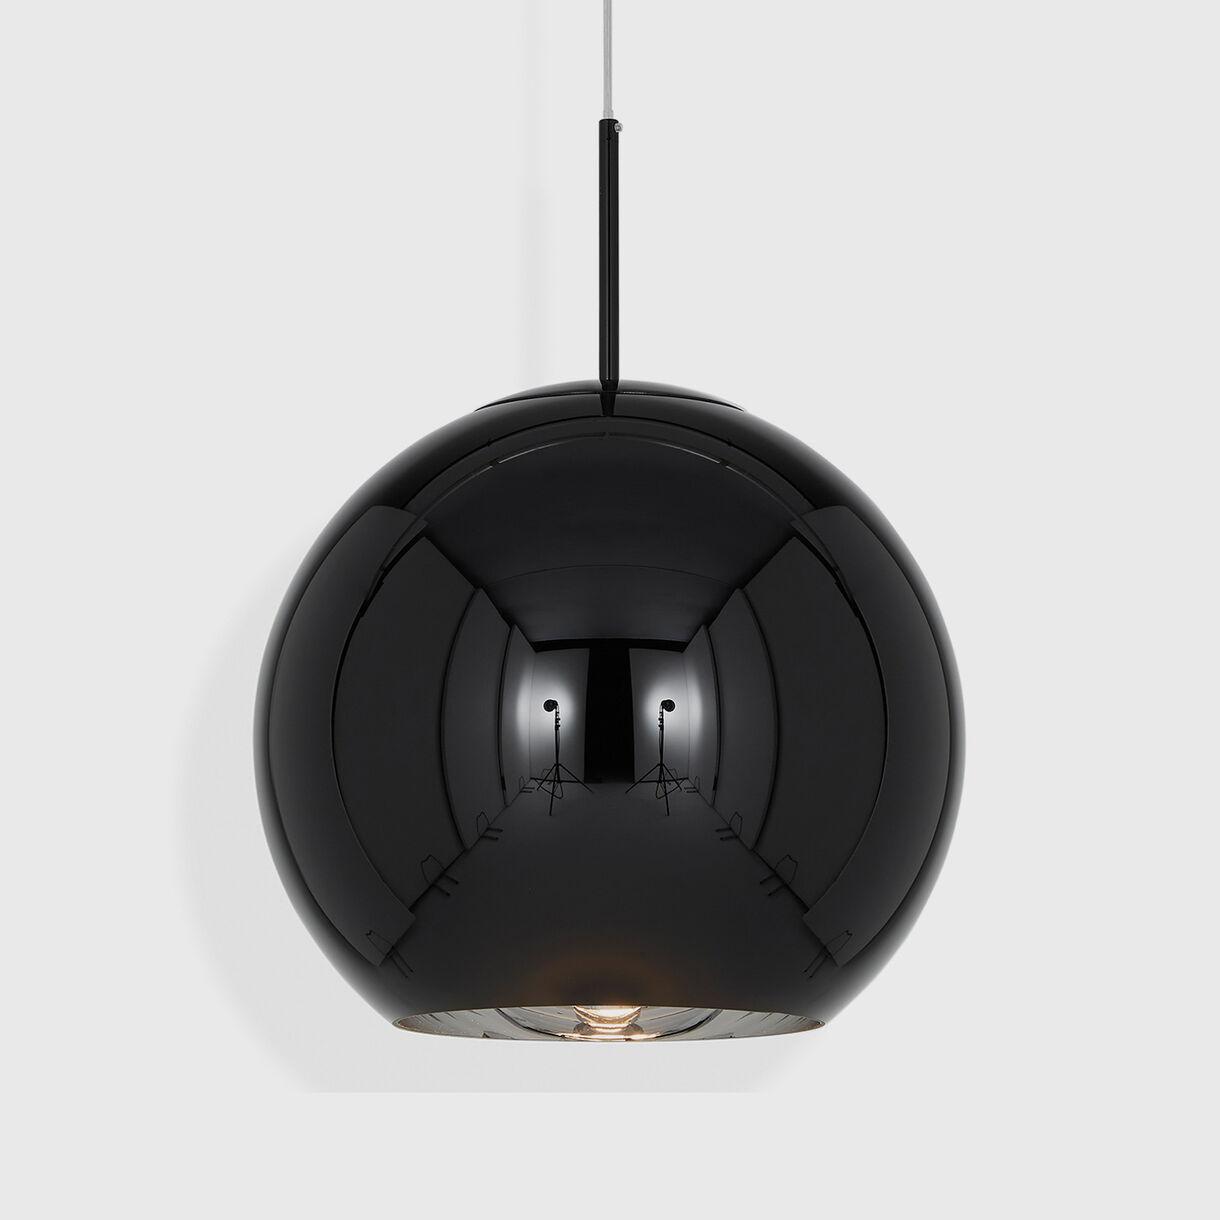 Copper Pendant Lamp 500mm, Black